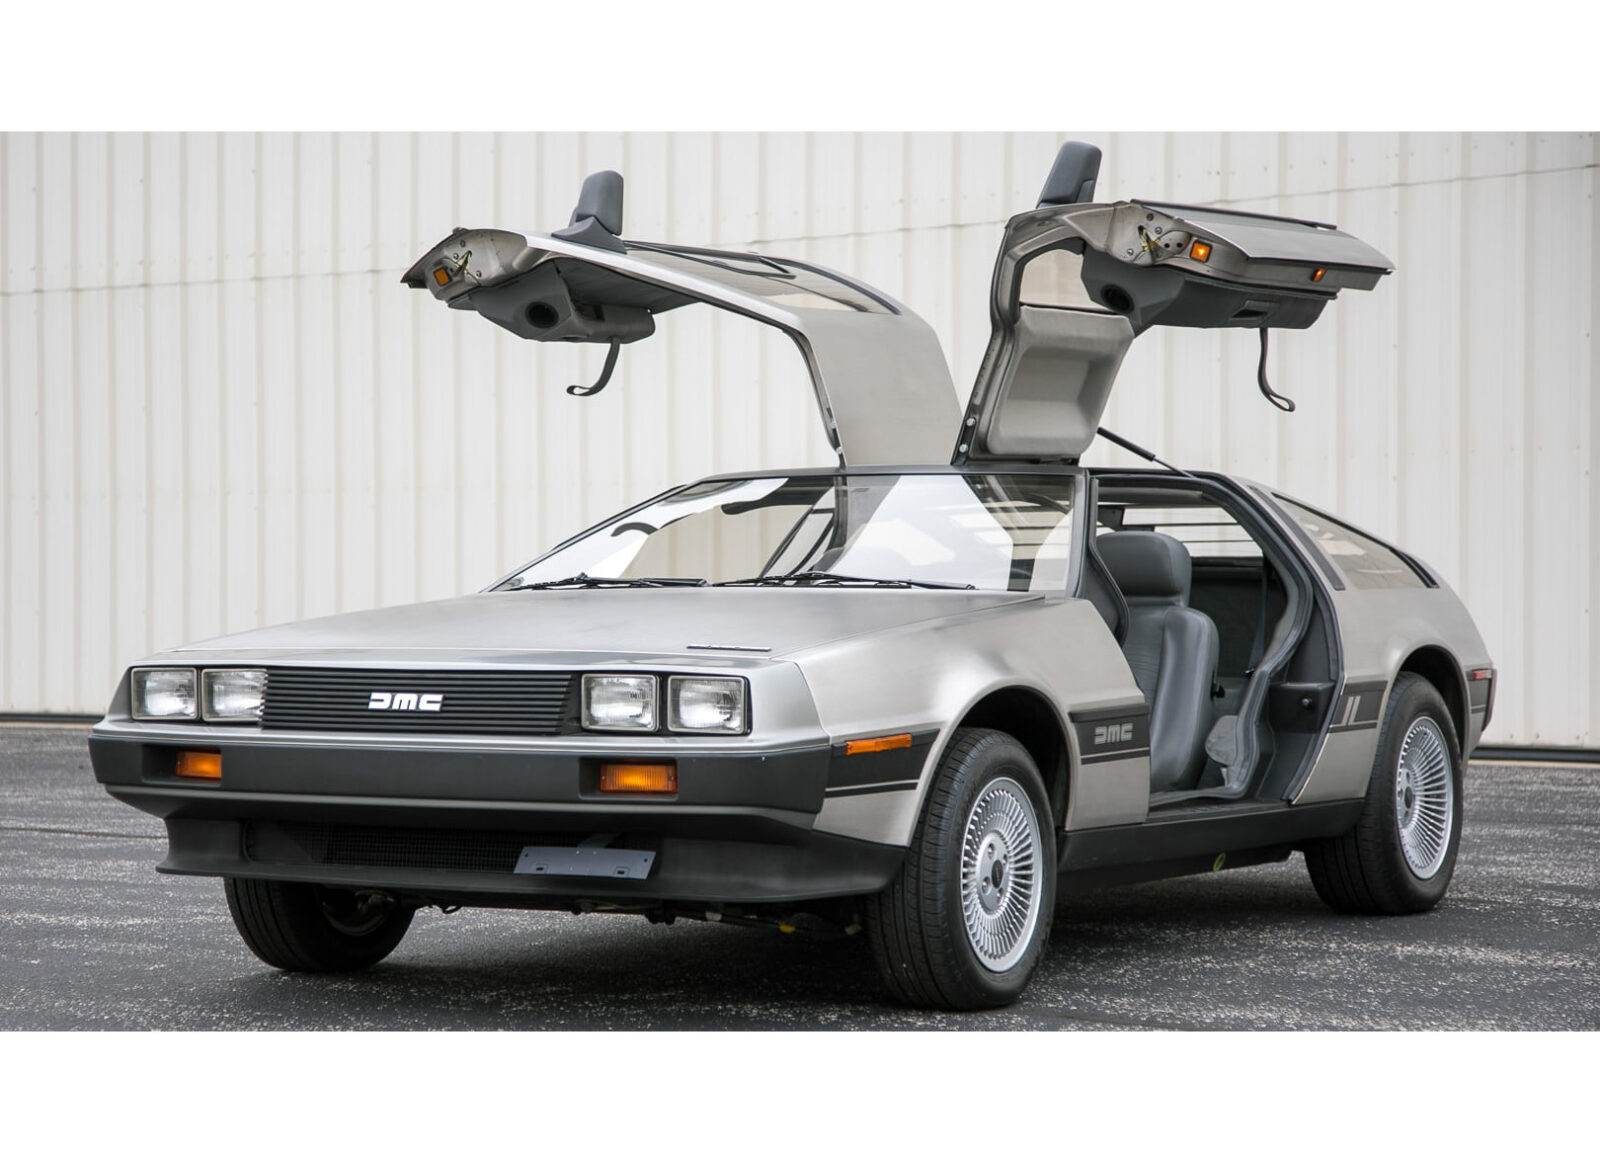 DeLorean DMC-12 Car